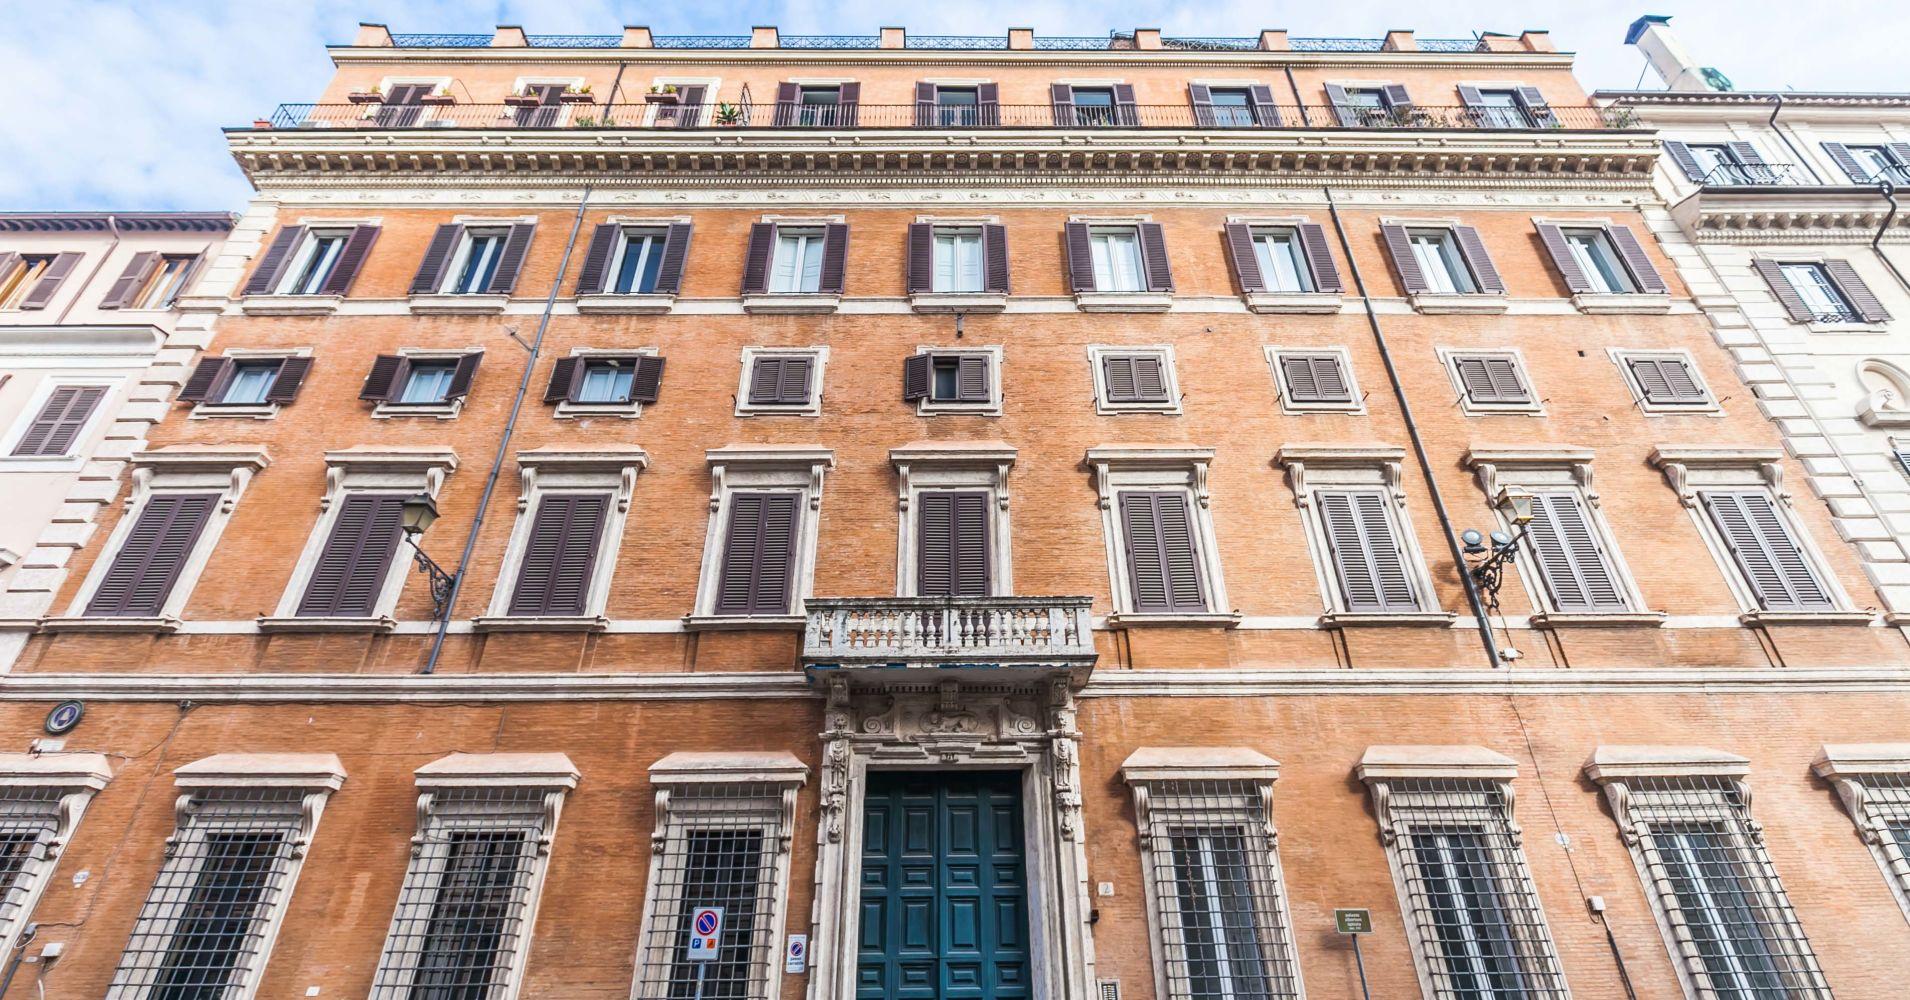 Está localizada na Piazza Di Campitelli, perto do Coliseu de Roma